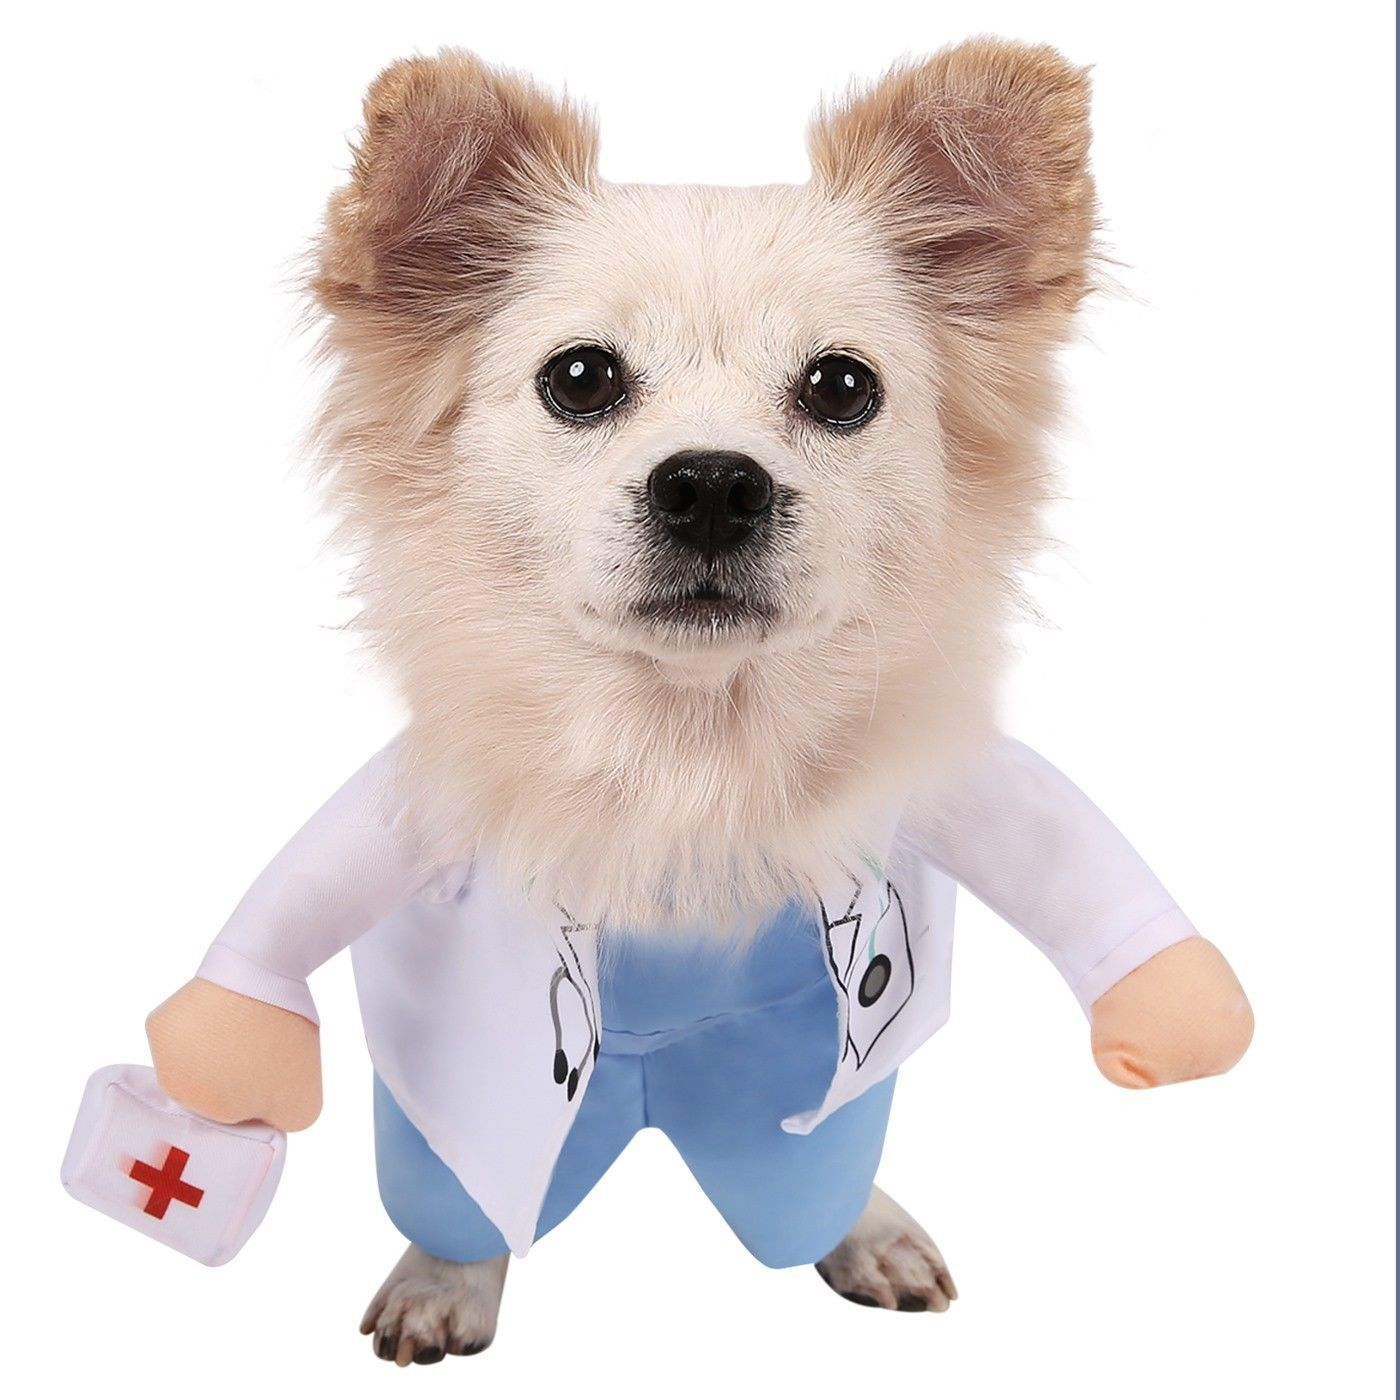 Costumes 52352 Doctor Dog Costume Halloween Pet Apparel